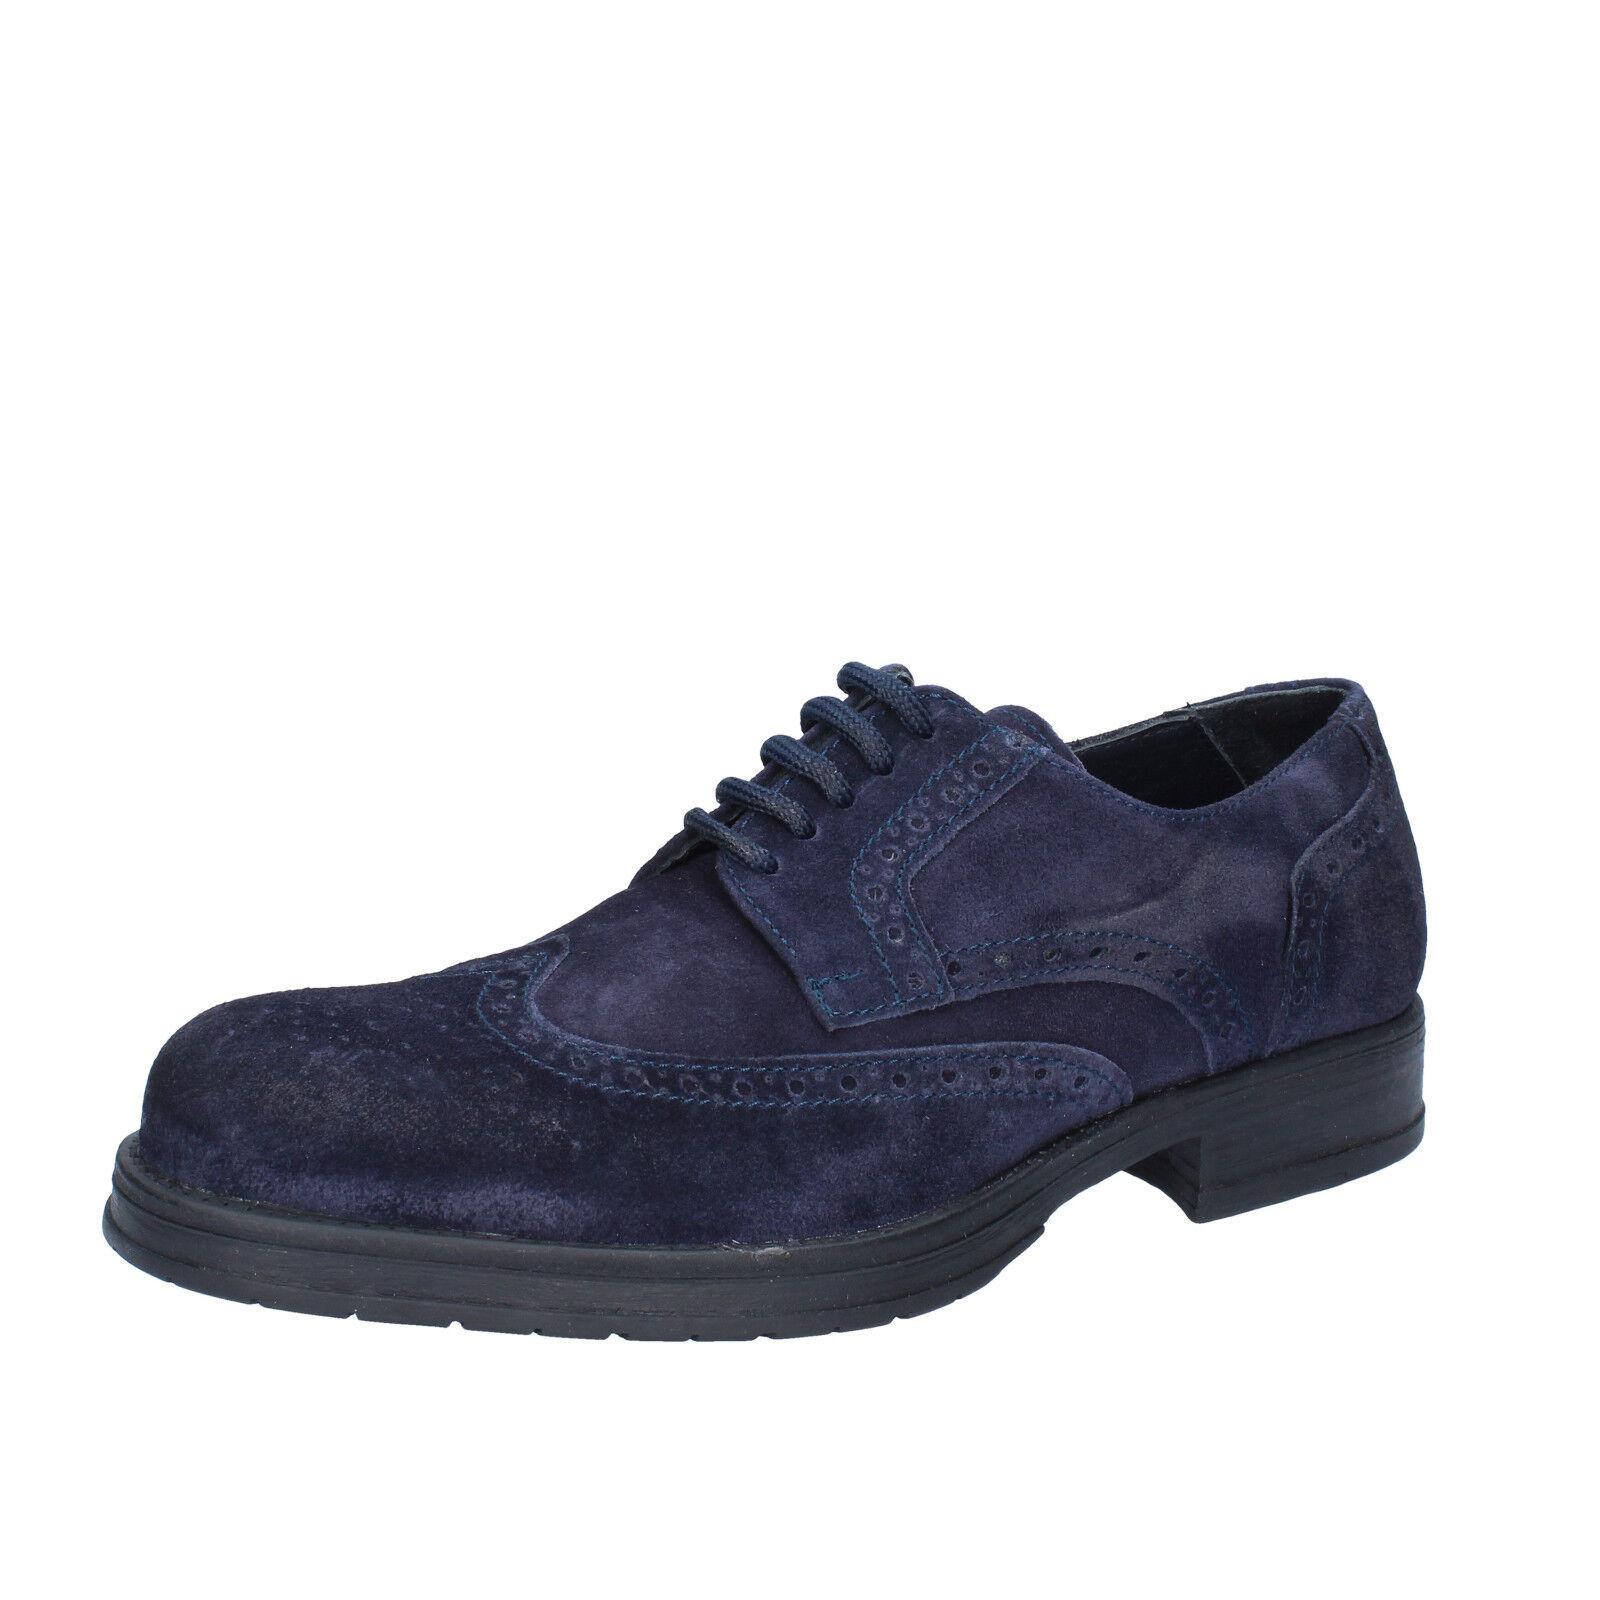 Men's shoes SALVO BARONE 7 (EU 40) elegant bluee suede BZ162-B